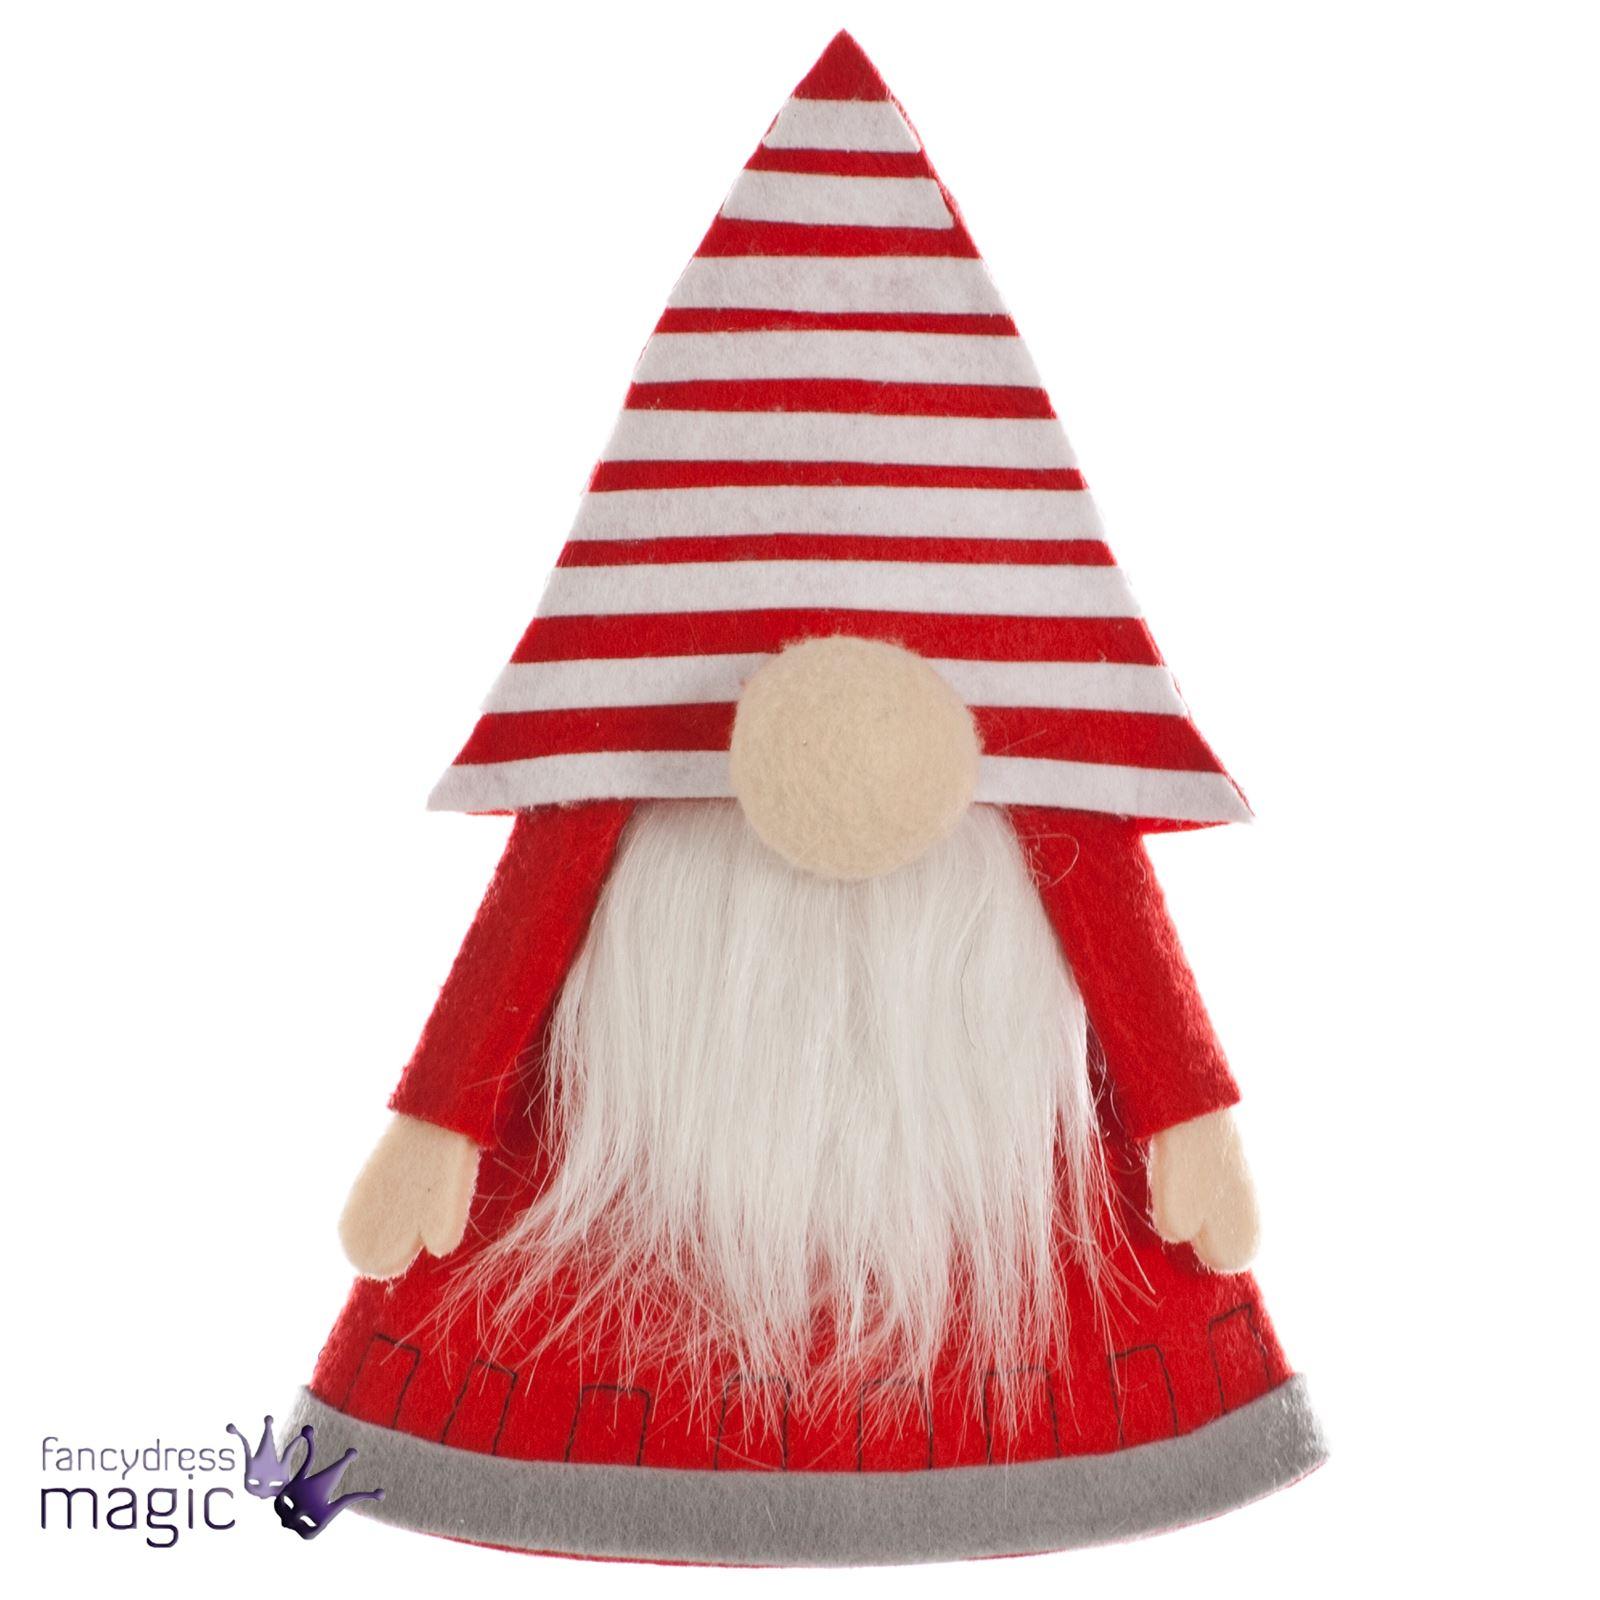 festive vintage gnome gonk santa doll christmas tree topper home gift decoration - Santa Christmas Tree Topper